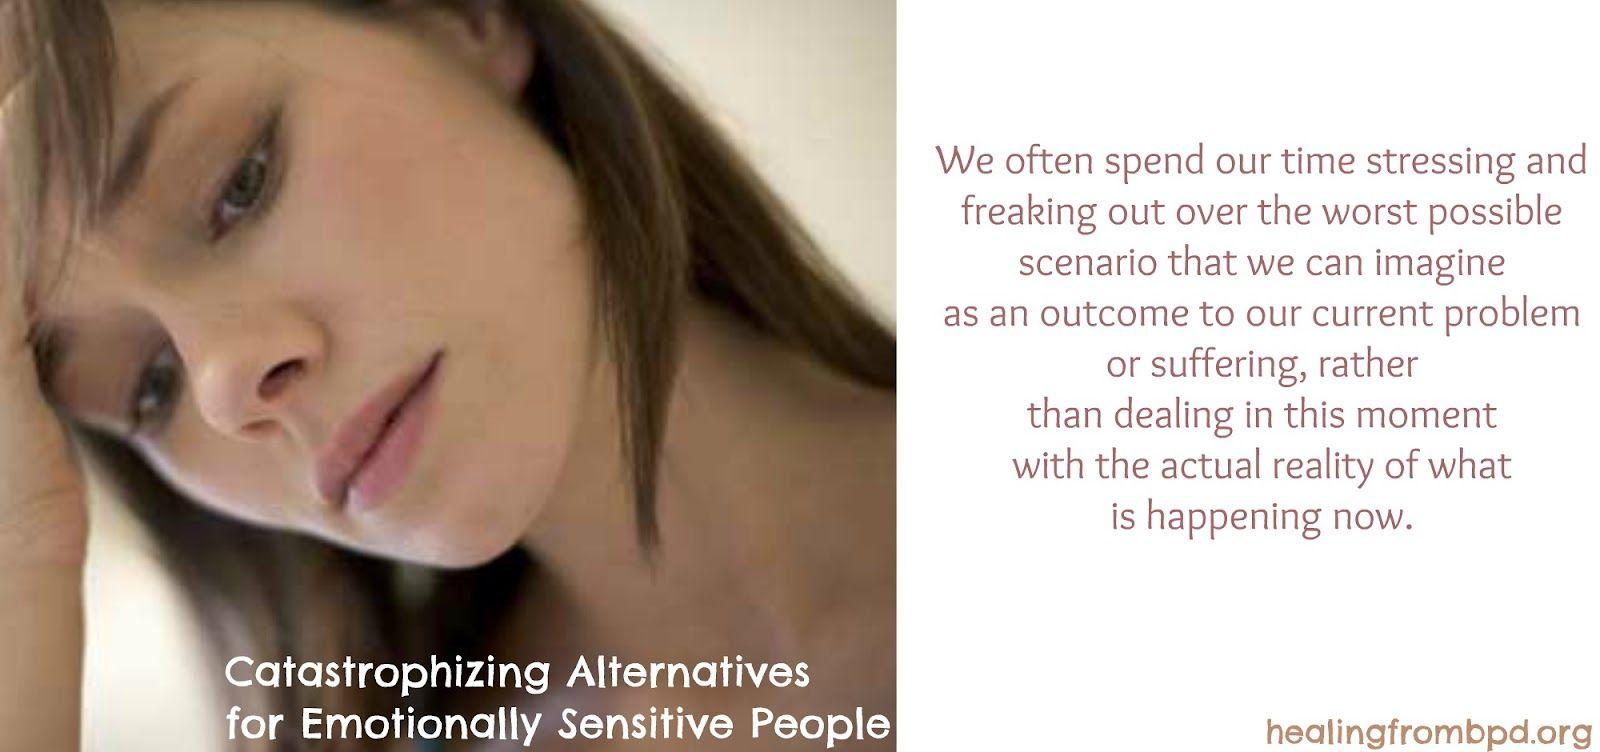 Catastrophizing Alternatives for Emotionally Sensitive People